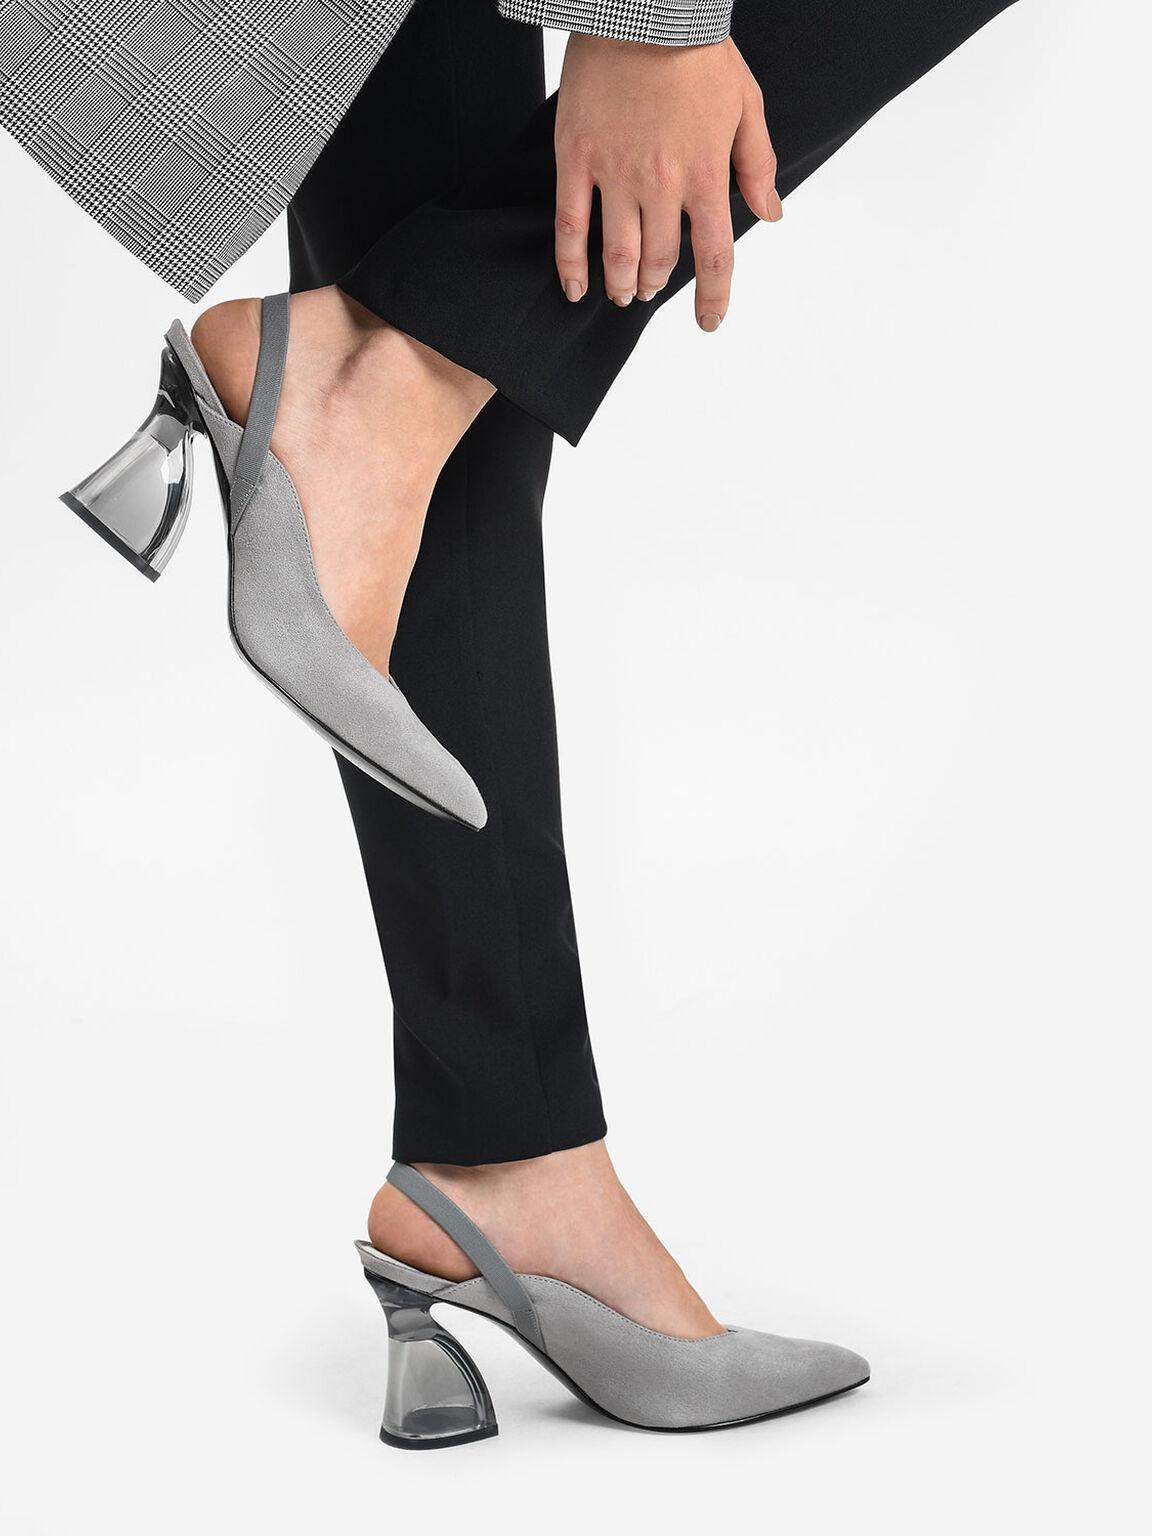 Lucite Sculptural Heel Slingbacks, Grey, hi-res